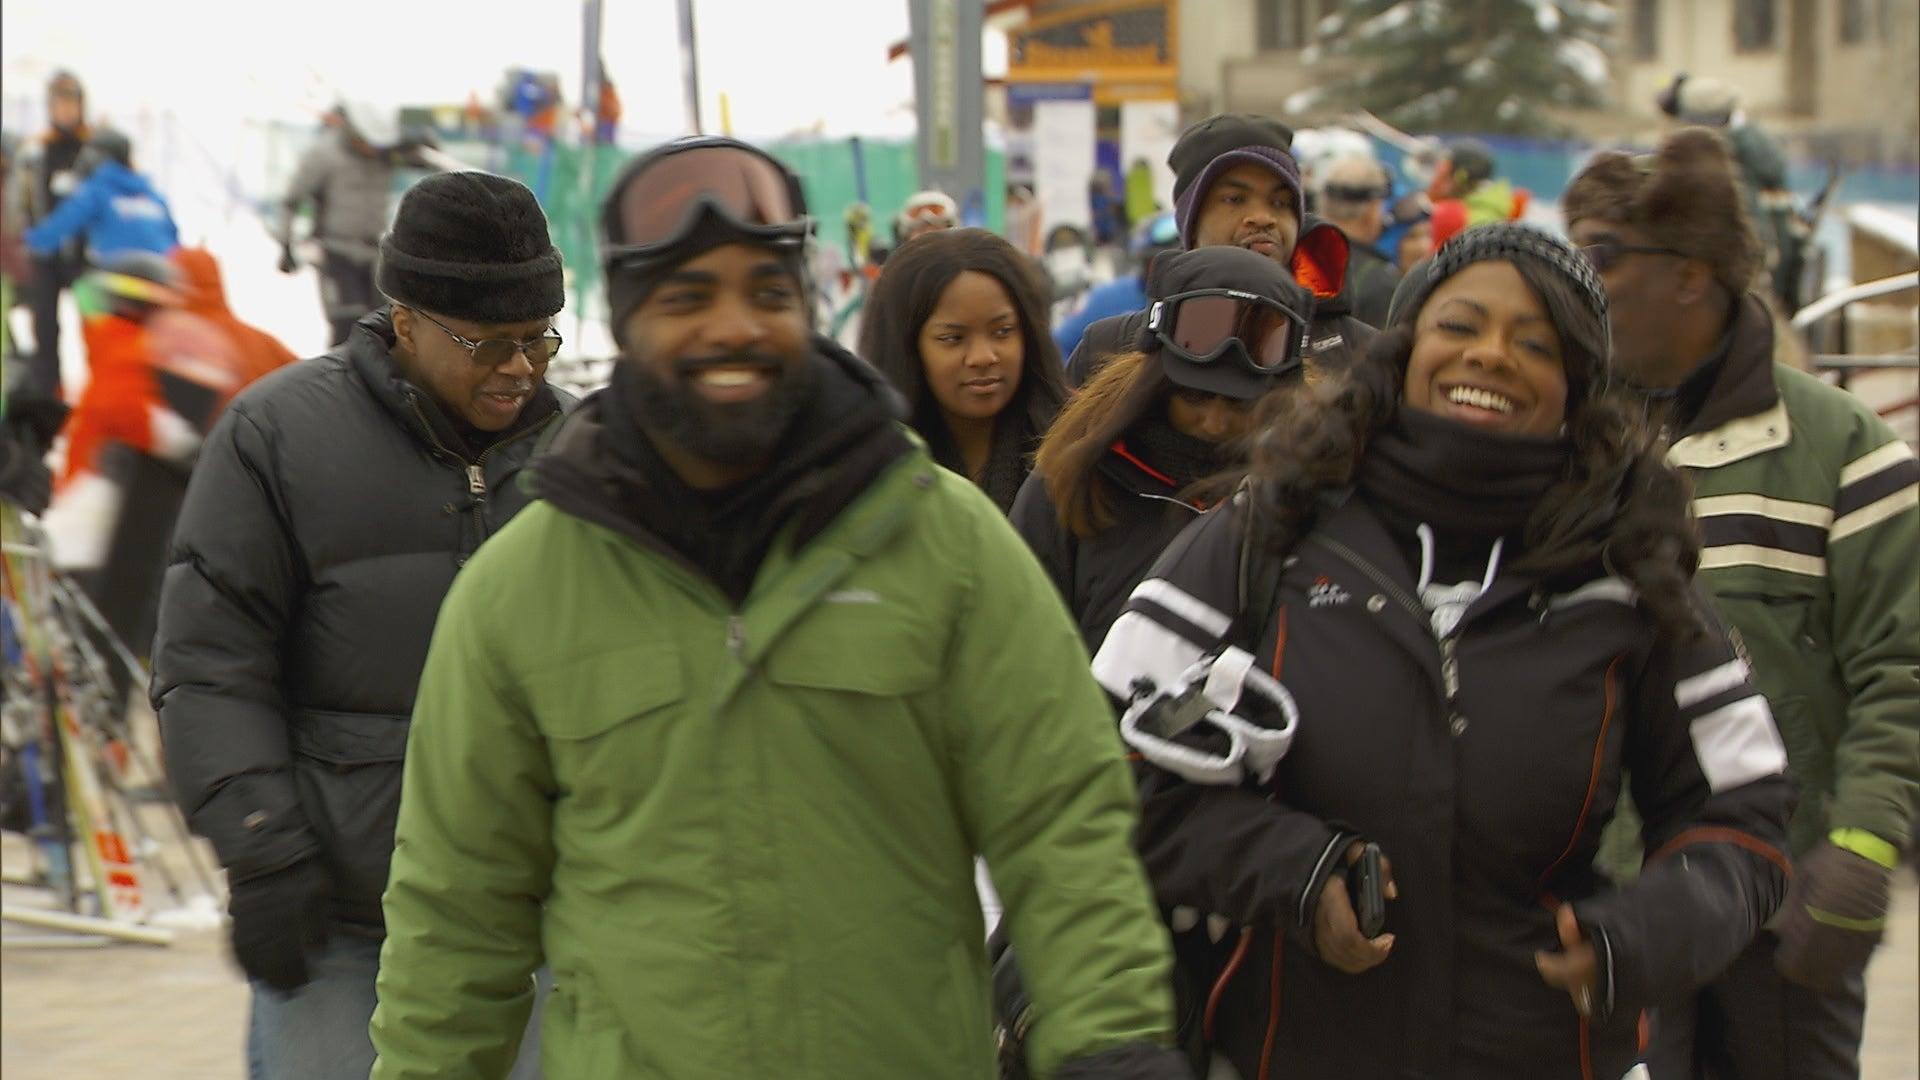 Kandi Burruss On What Really Goes Down During 'Kandi's Ski Trip'